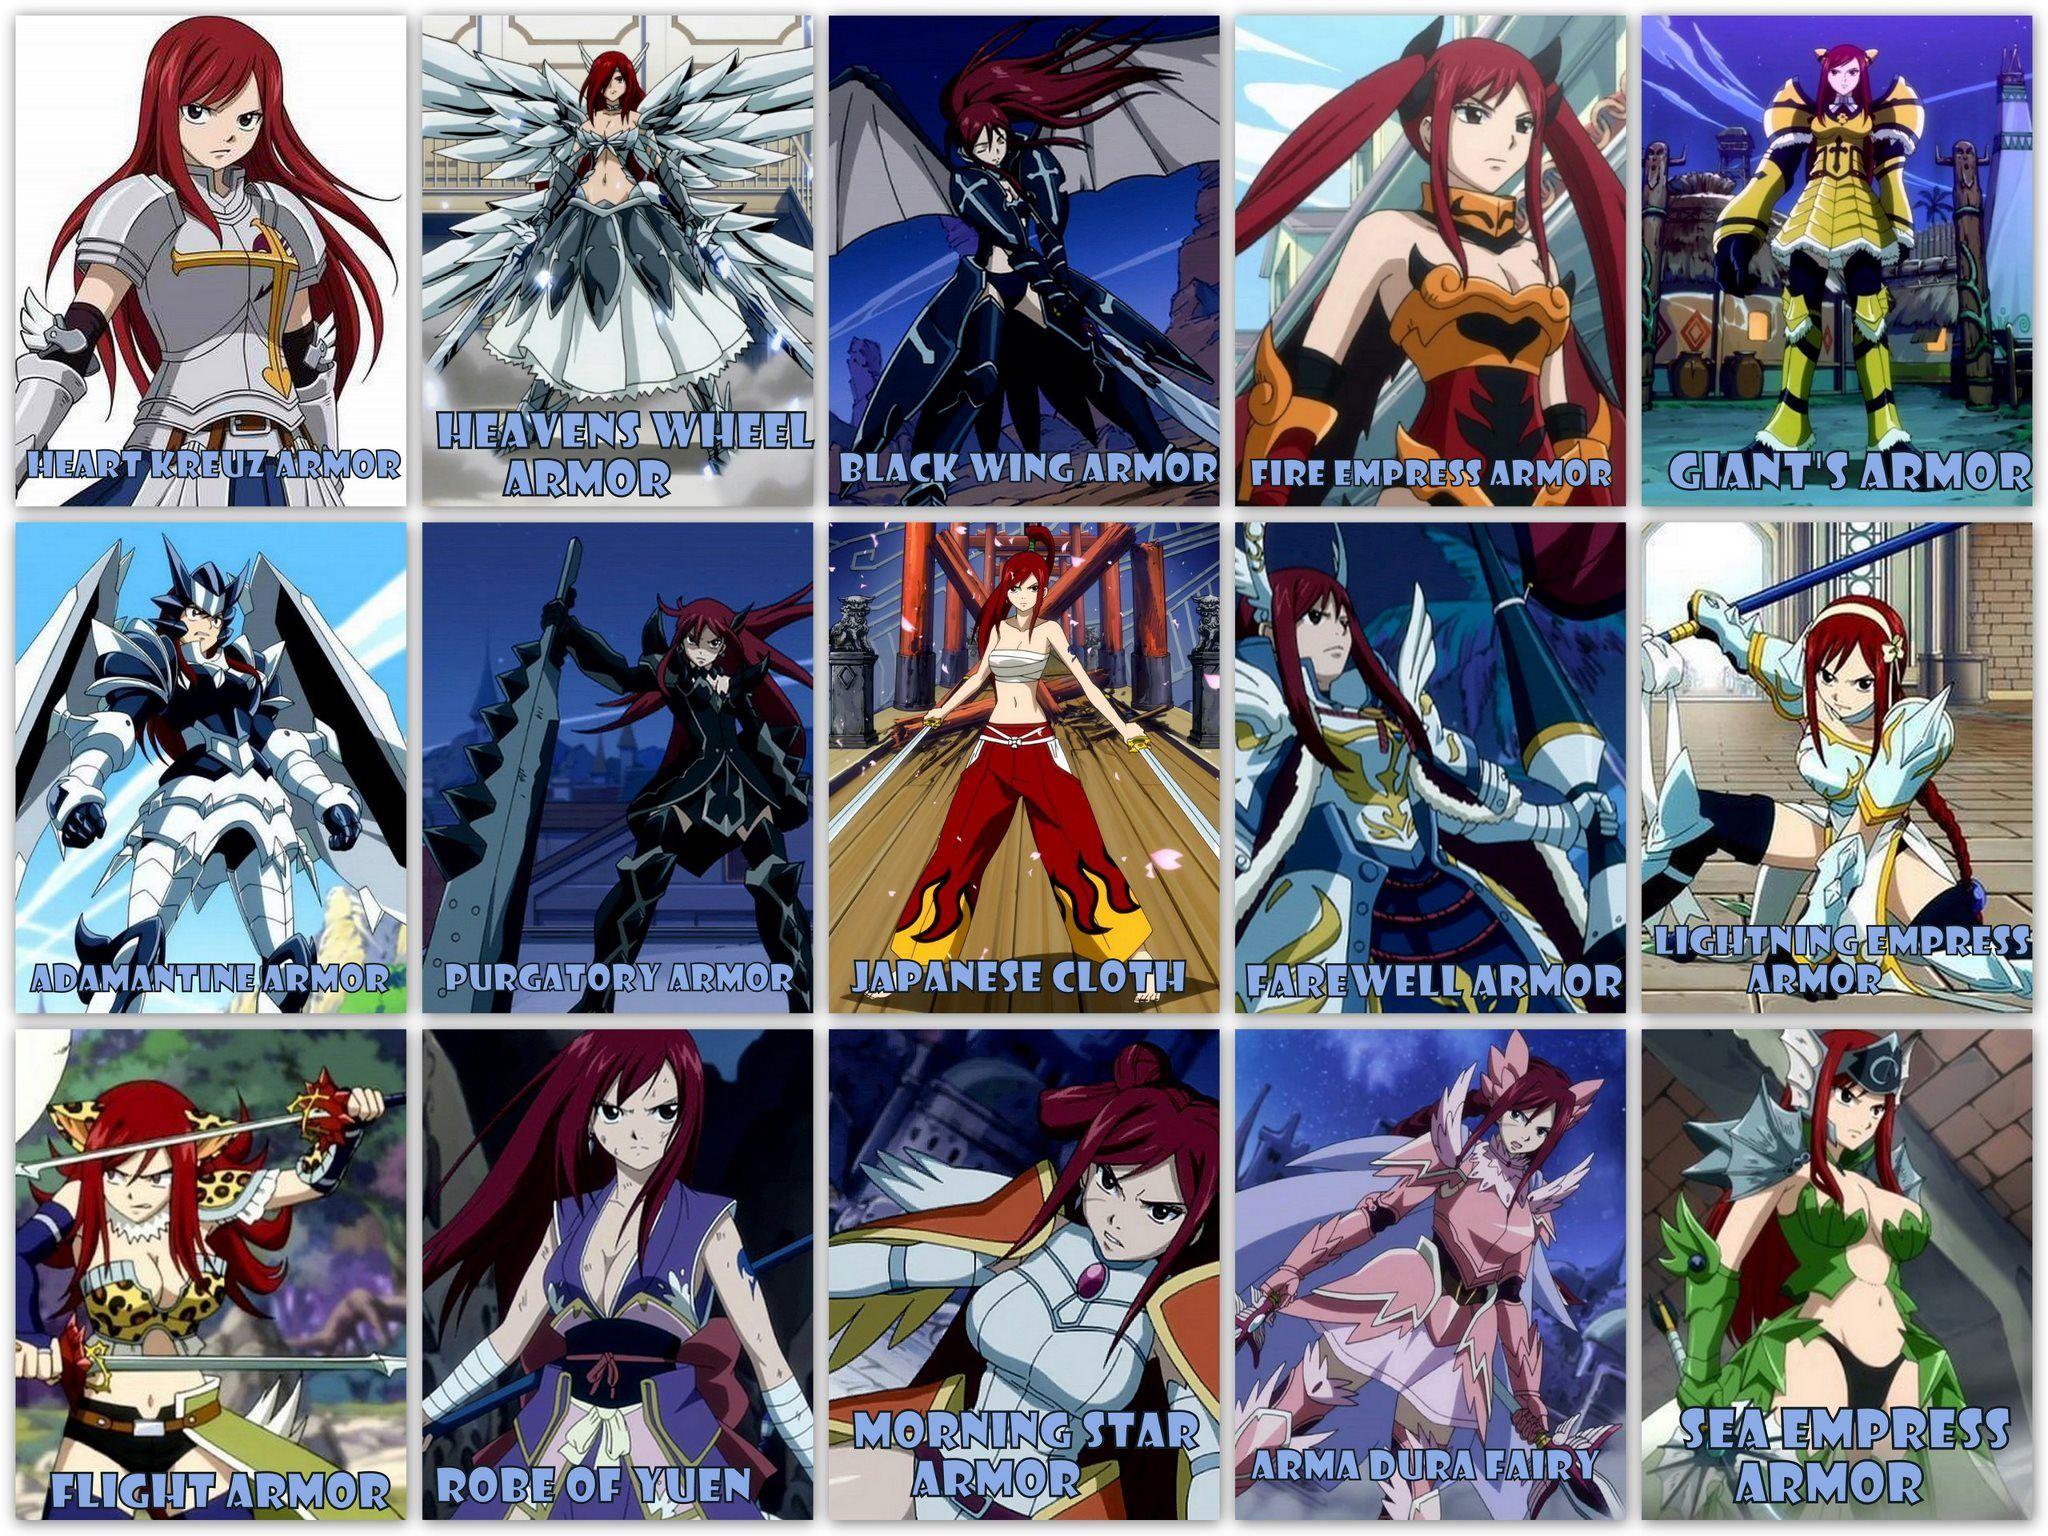 Anime/manga: Fairy Tail Character: Erza's armors.